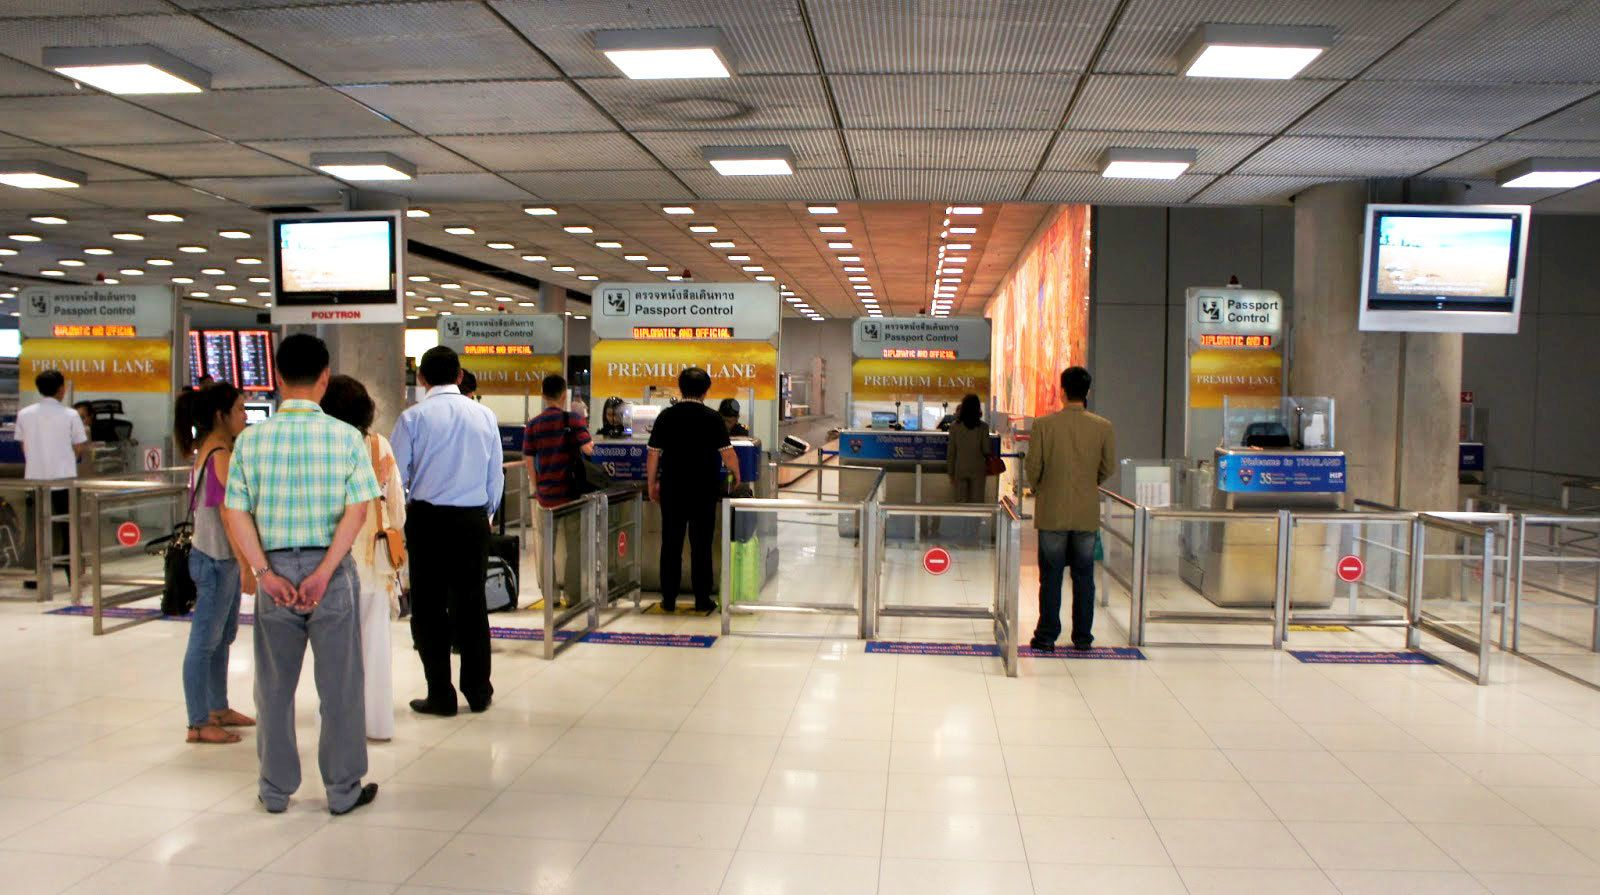 Airport passengers going through Premium Lane service